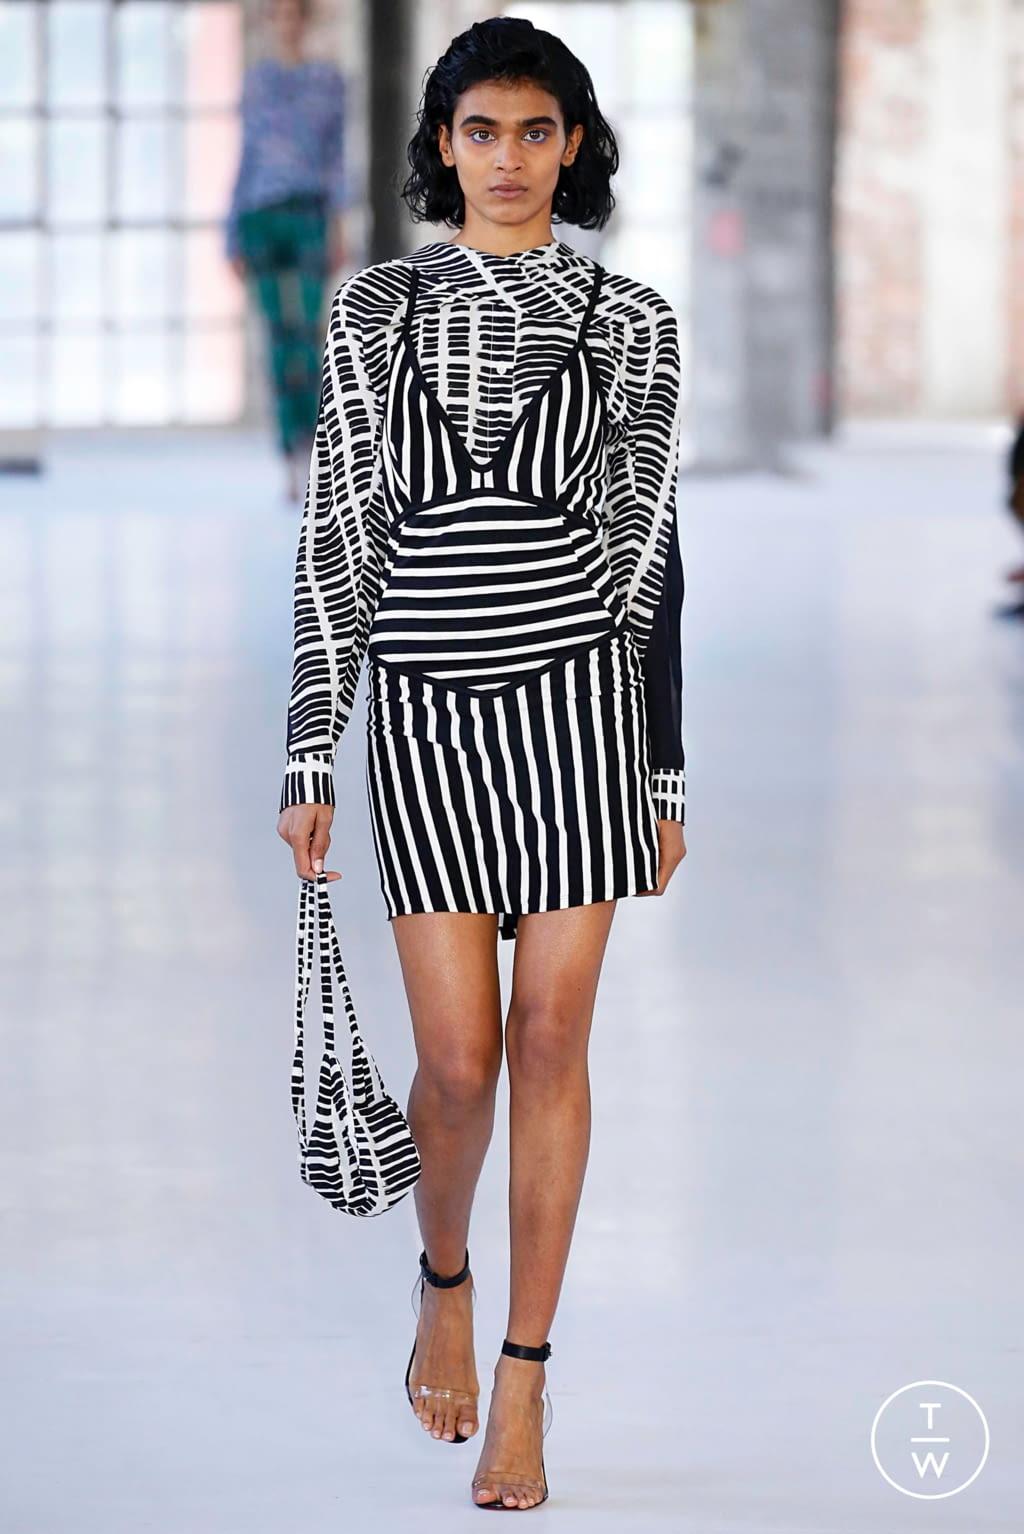 Fashion Week Paris Spring/Summer 2019 look 6 de la collection Atlein womenswear